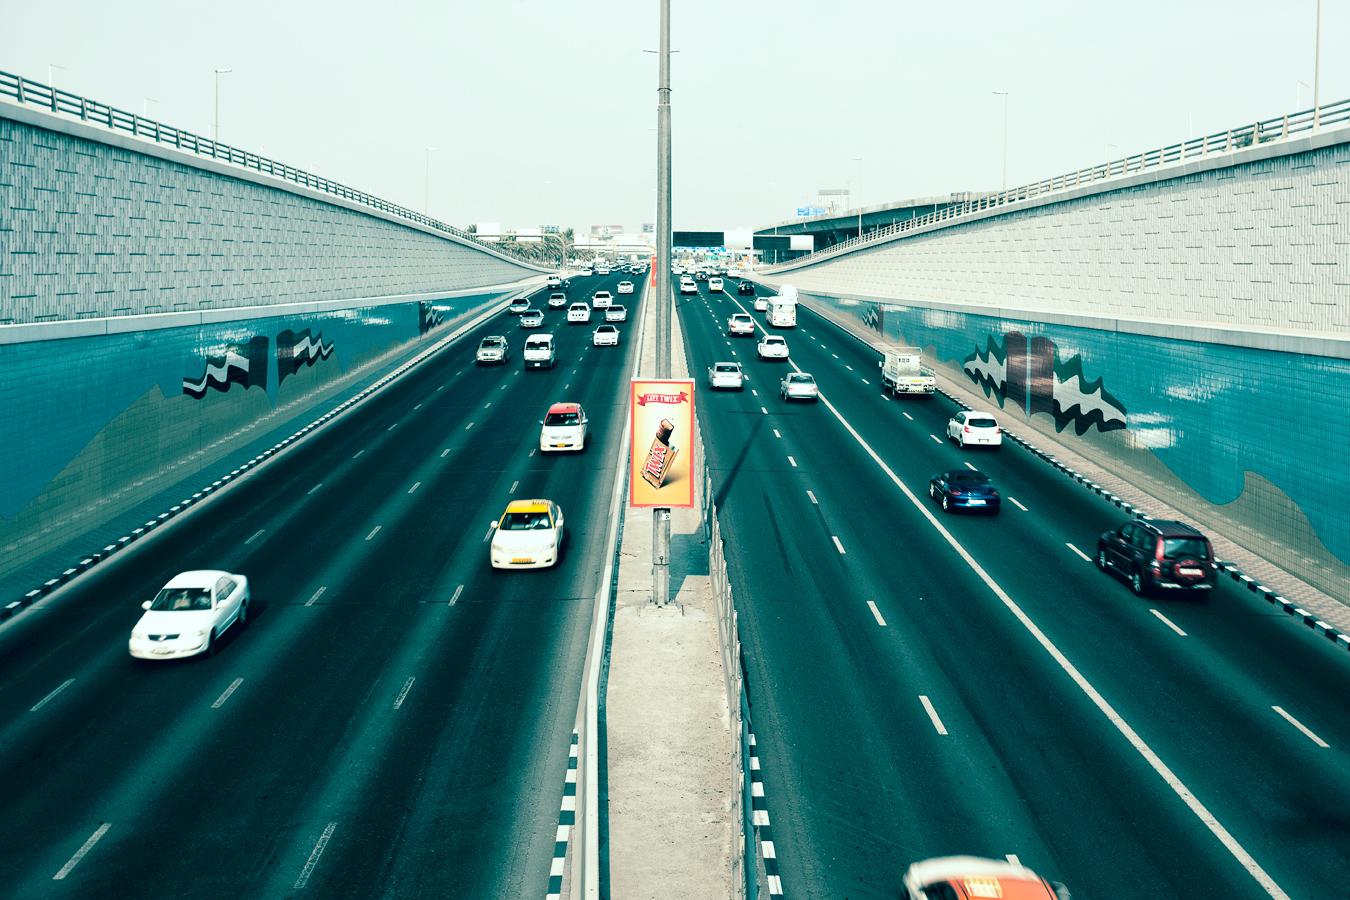 Streets of Dubai (2013)